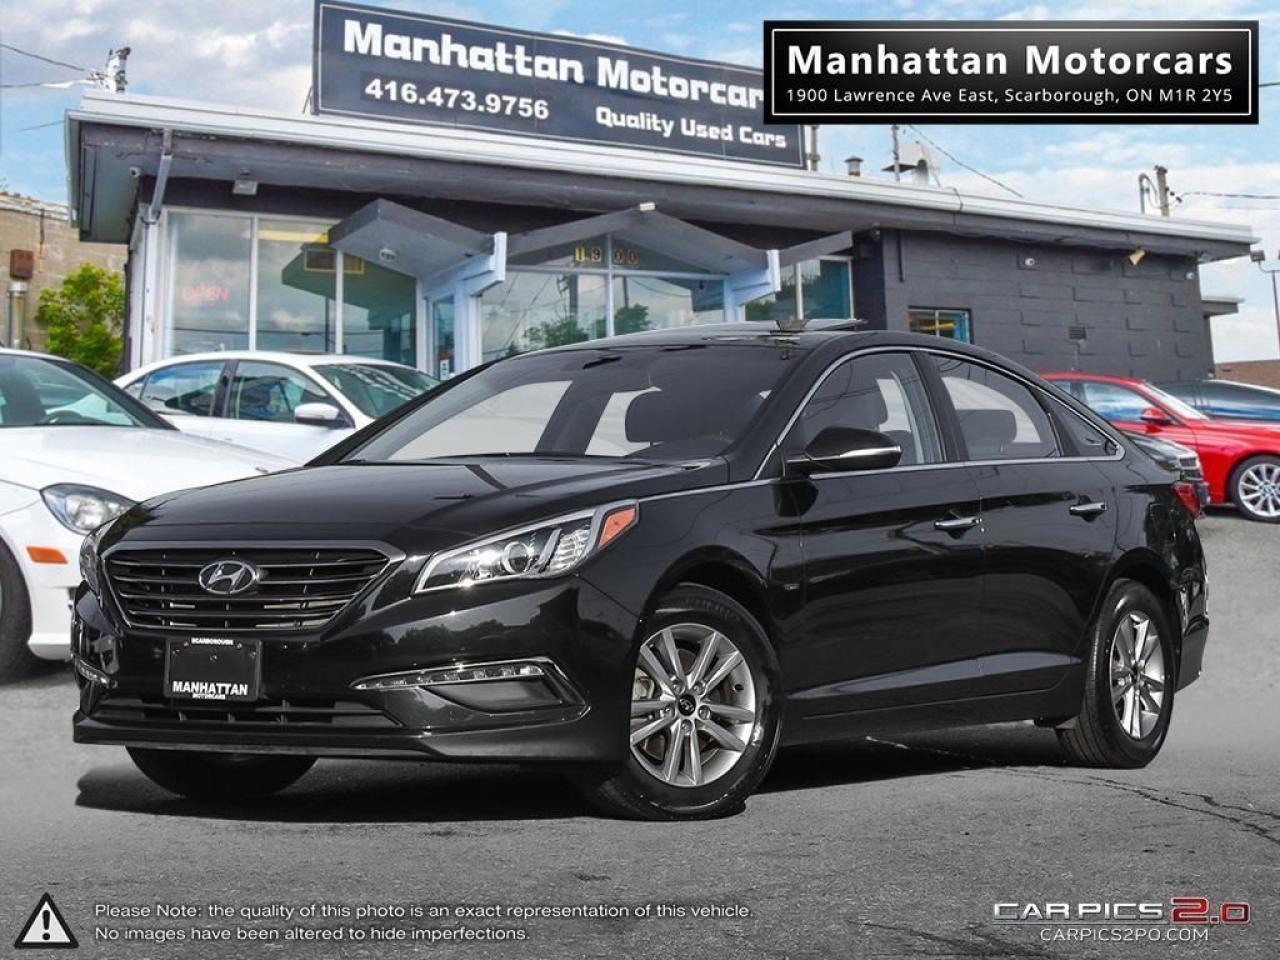 2017 Hyundai Sonata GLS |SUNROOF|WARRANTY|CAMERA|PHONE|37,000KM